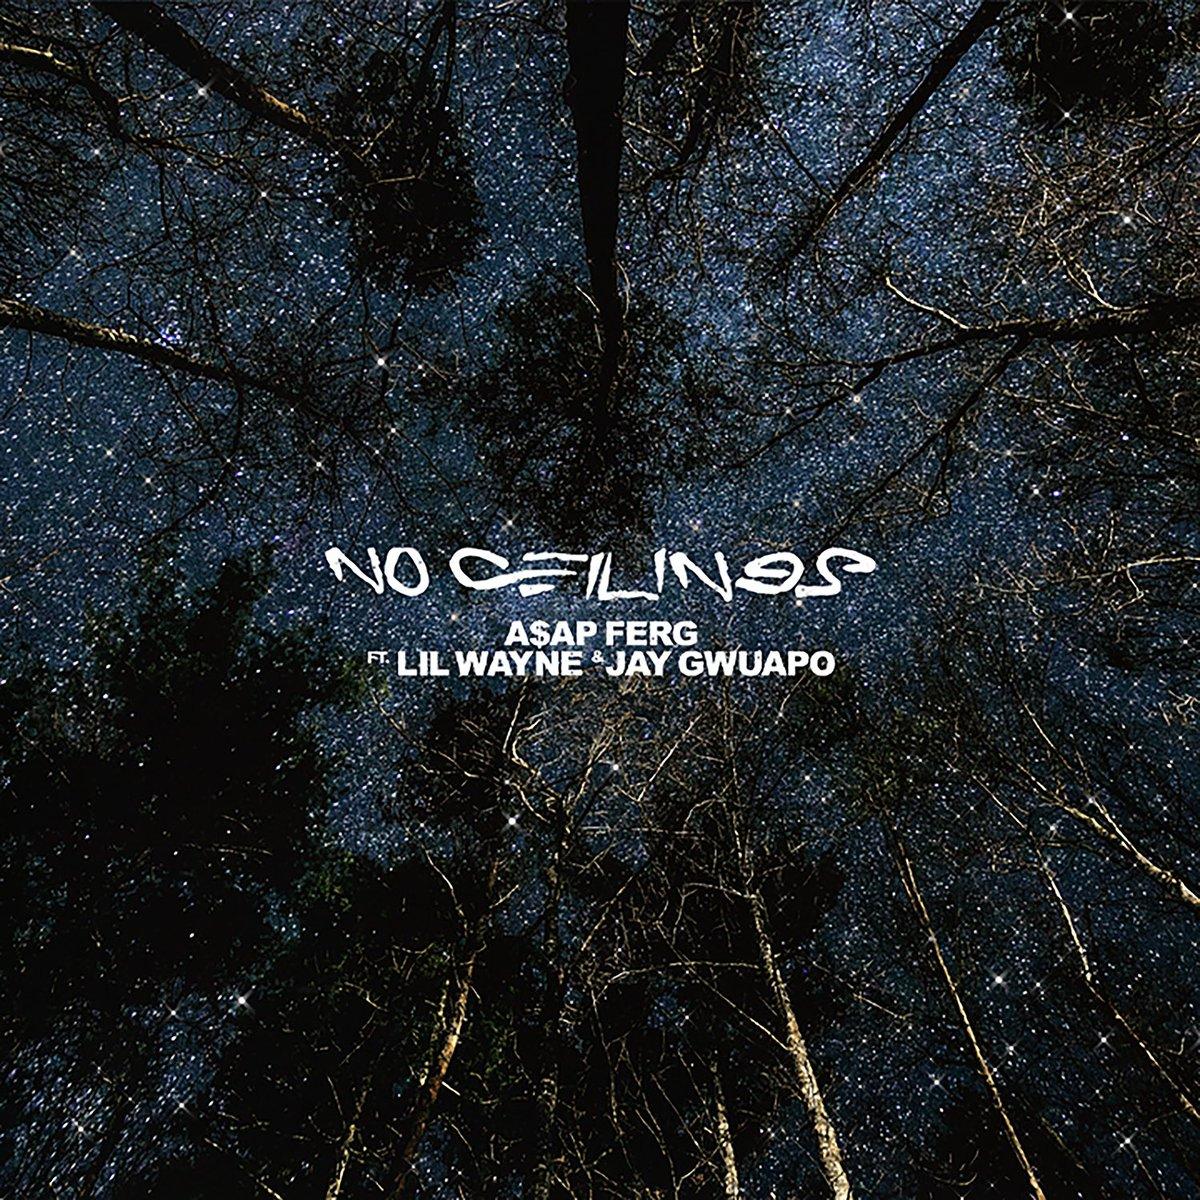 """No Ceilings"" tomorrow 🔥🔥🐐🐐@LilTunechi x @jaygwuapo"